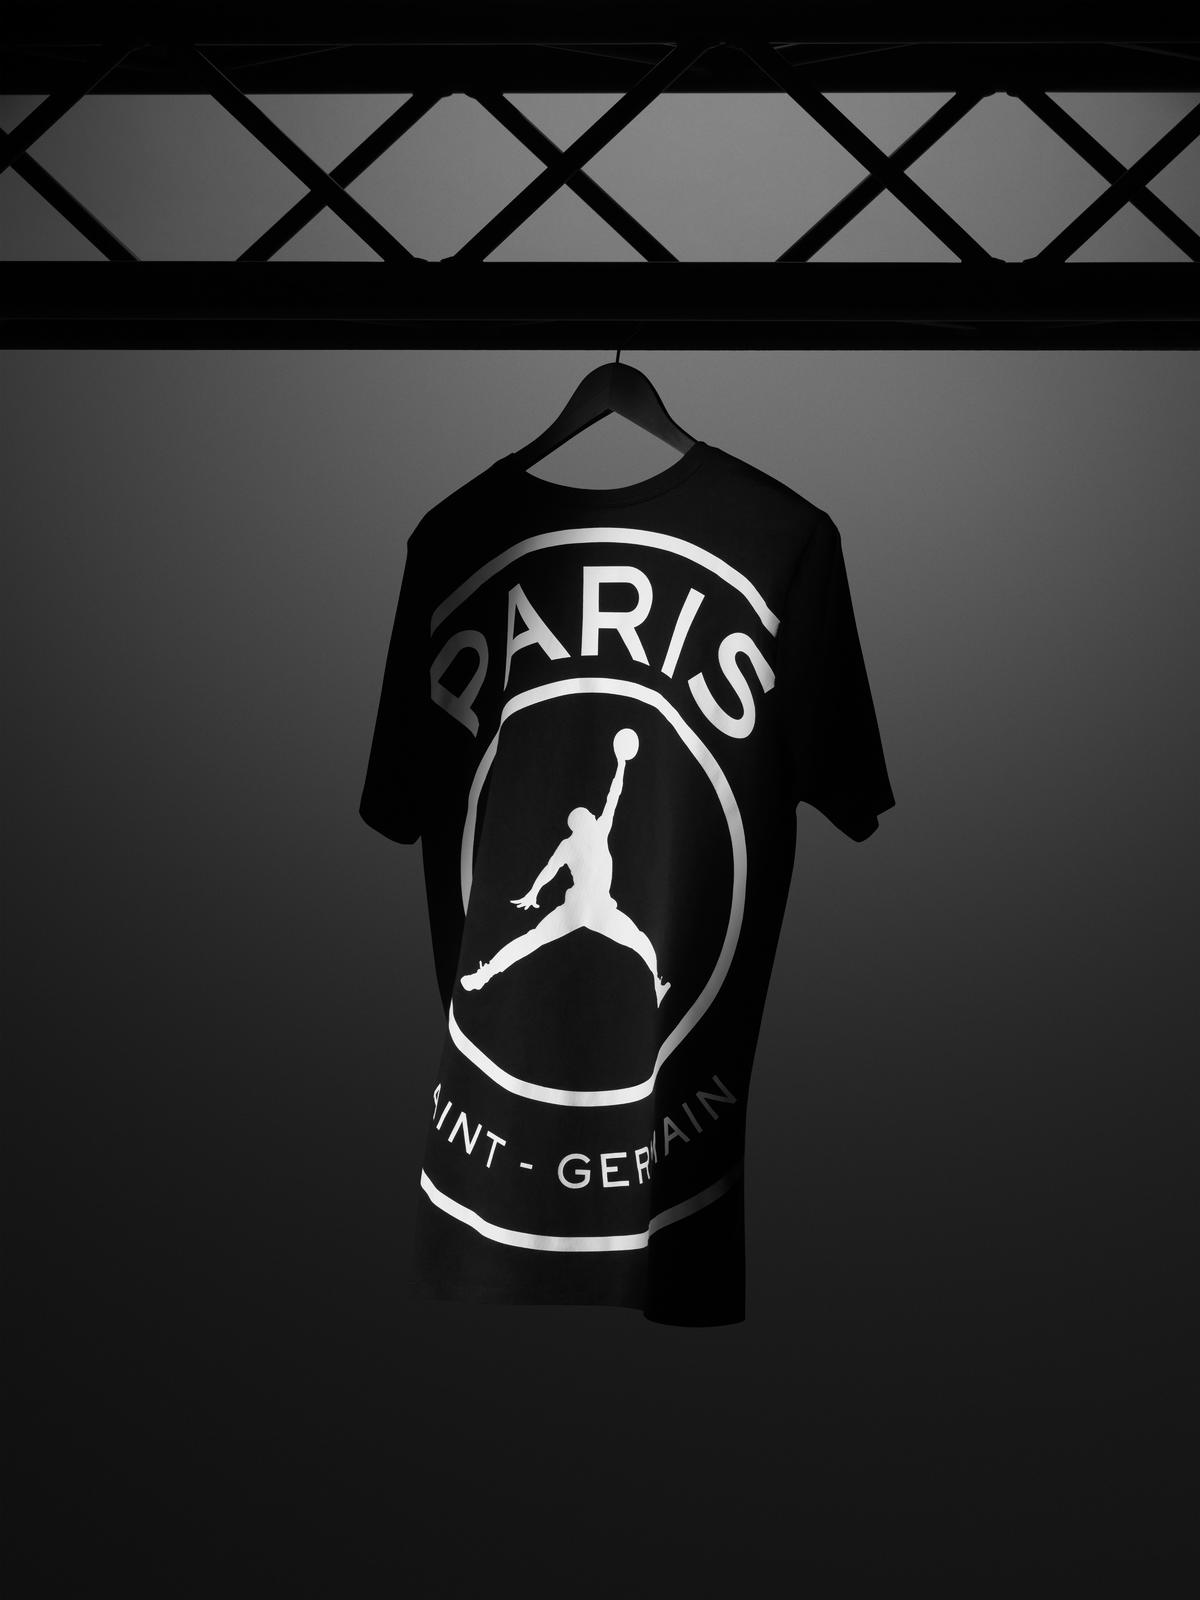 Jordan_Brand__Paris_Saint-Germain_as_its_First-Ever_Football_Club_Soccer_15_81725